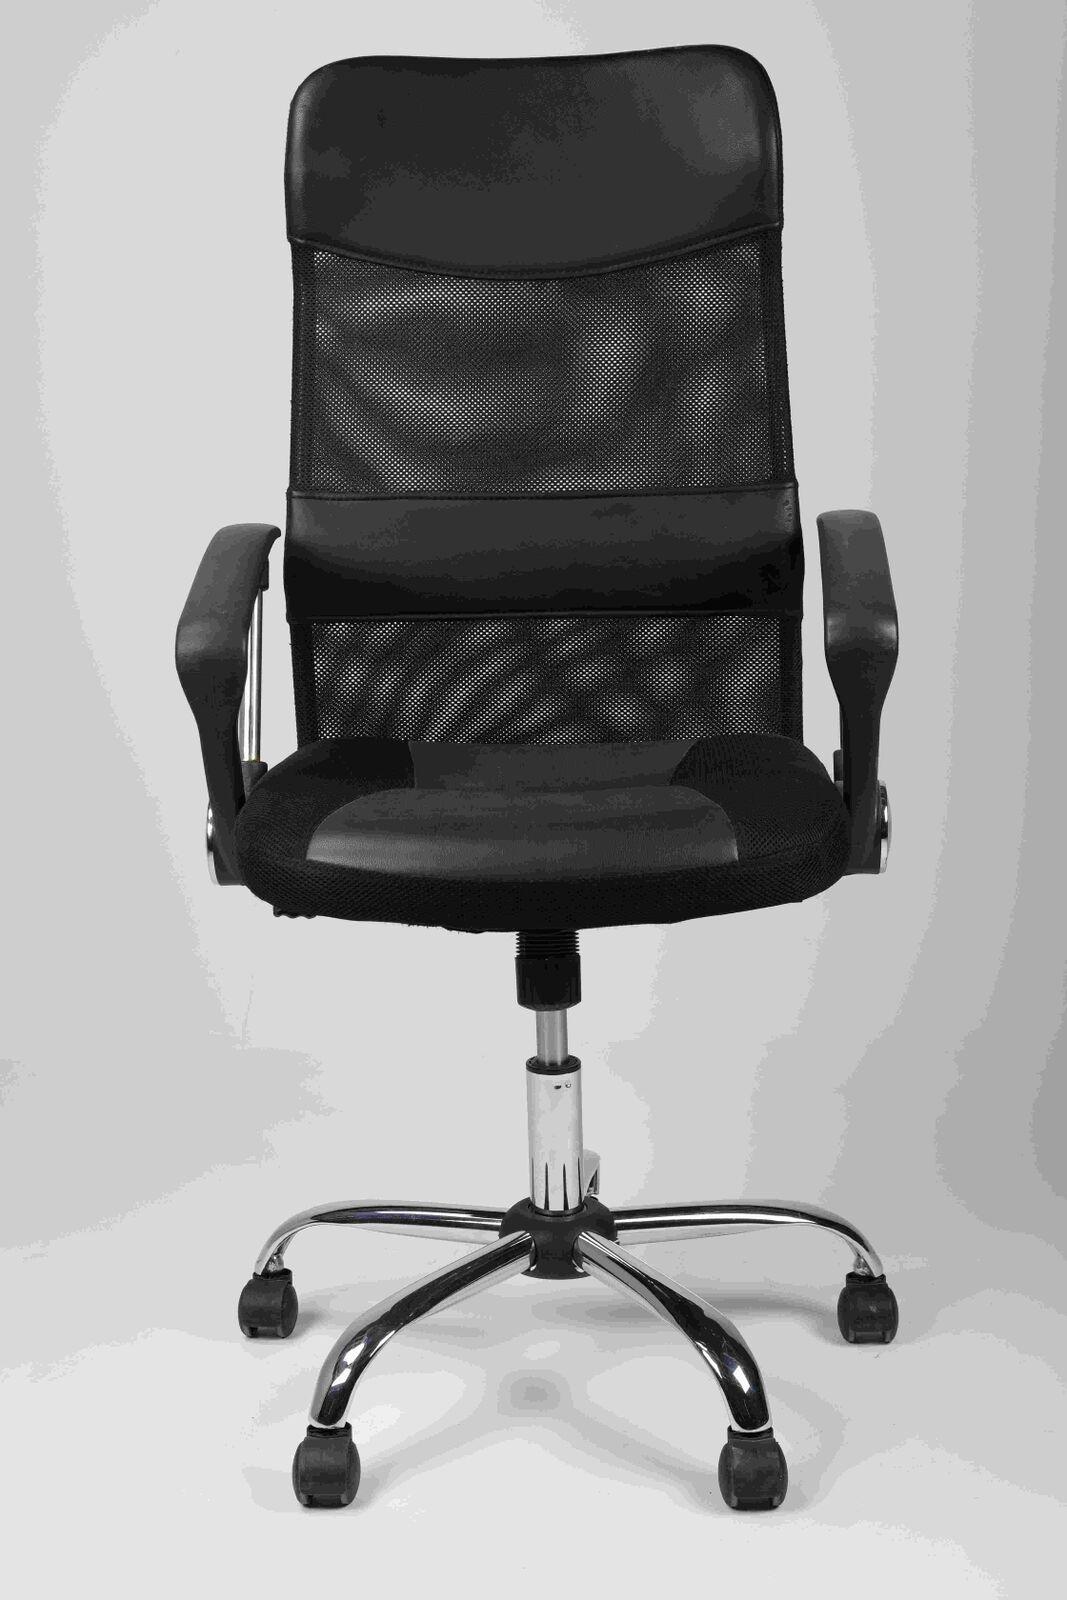 Fox Office Chair Black._preview